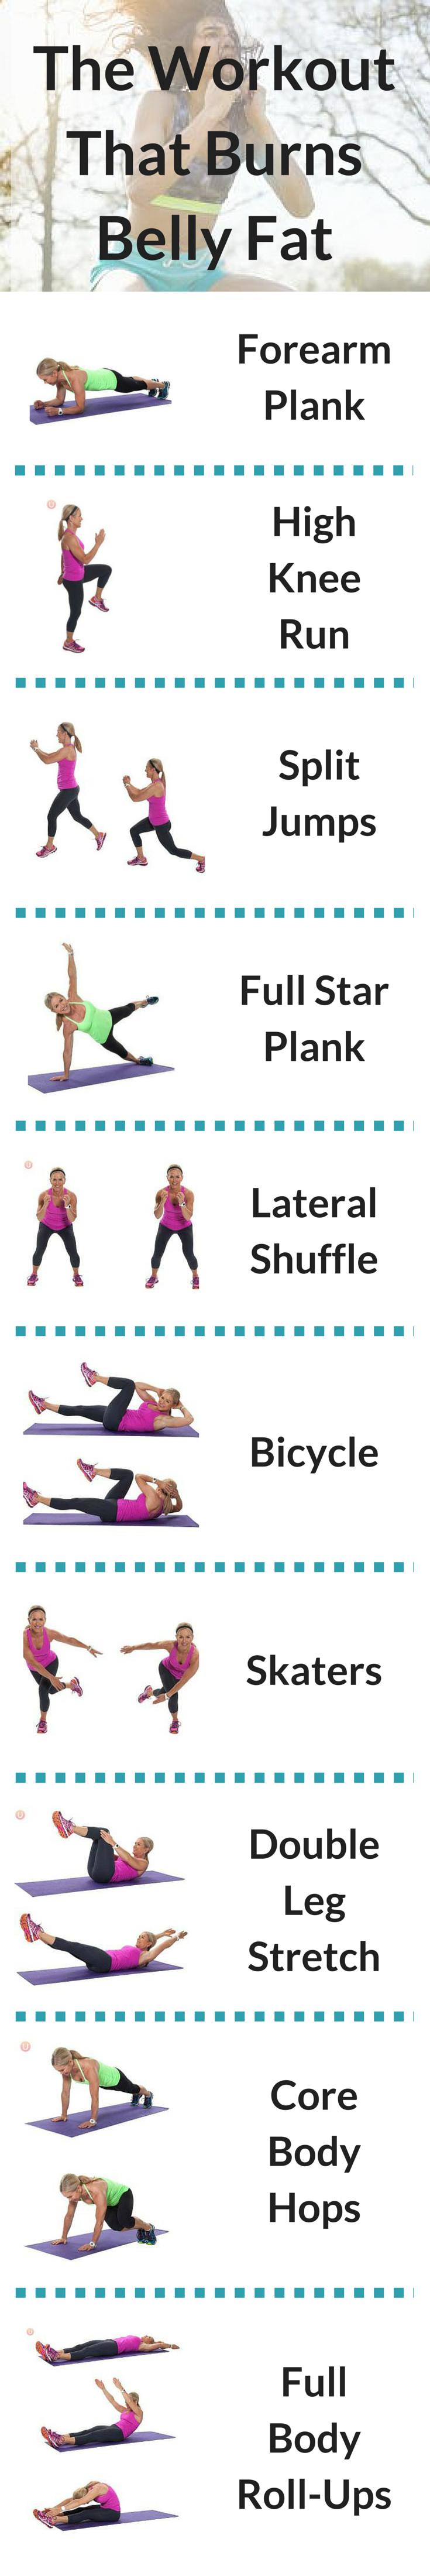 Lose weight keep muscle mass photo 4